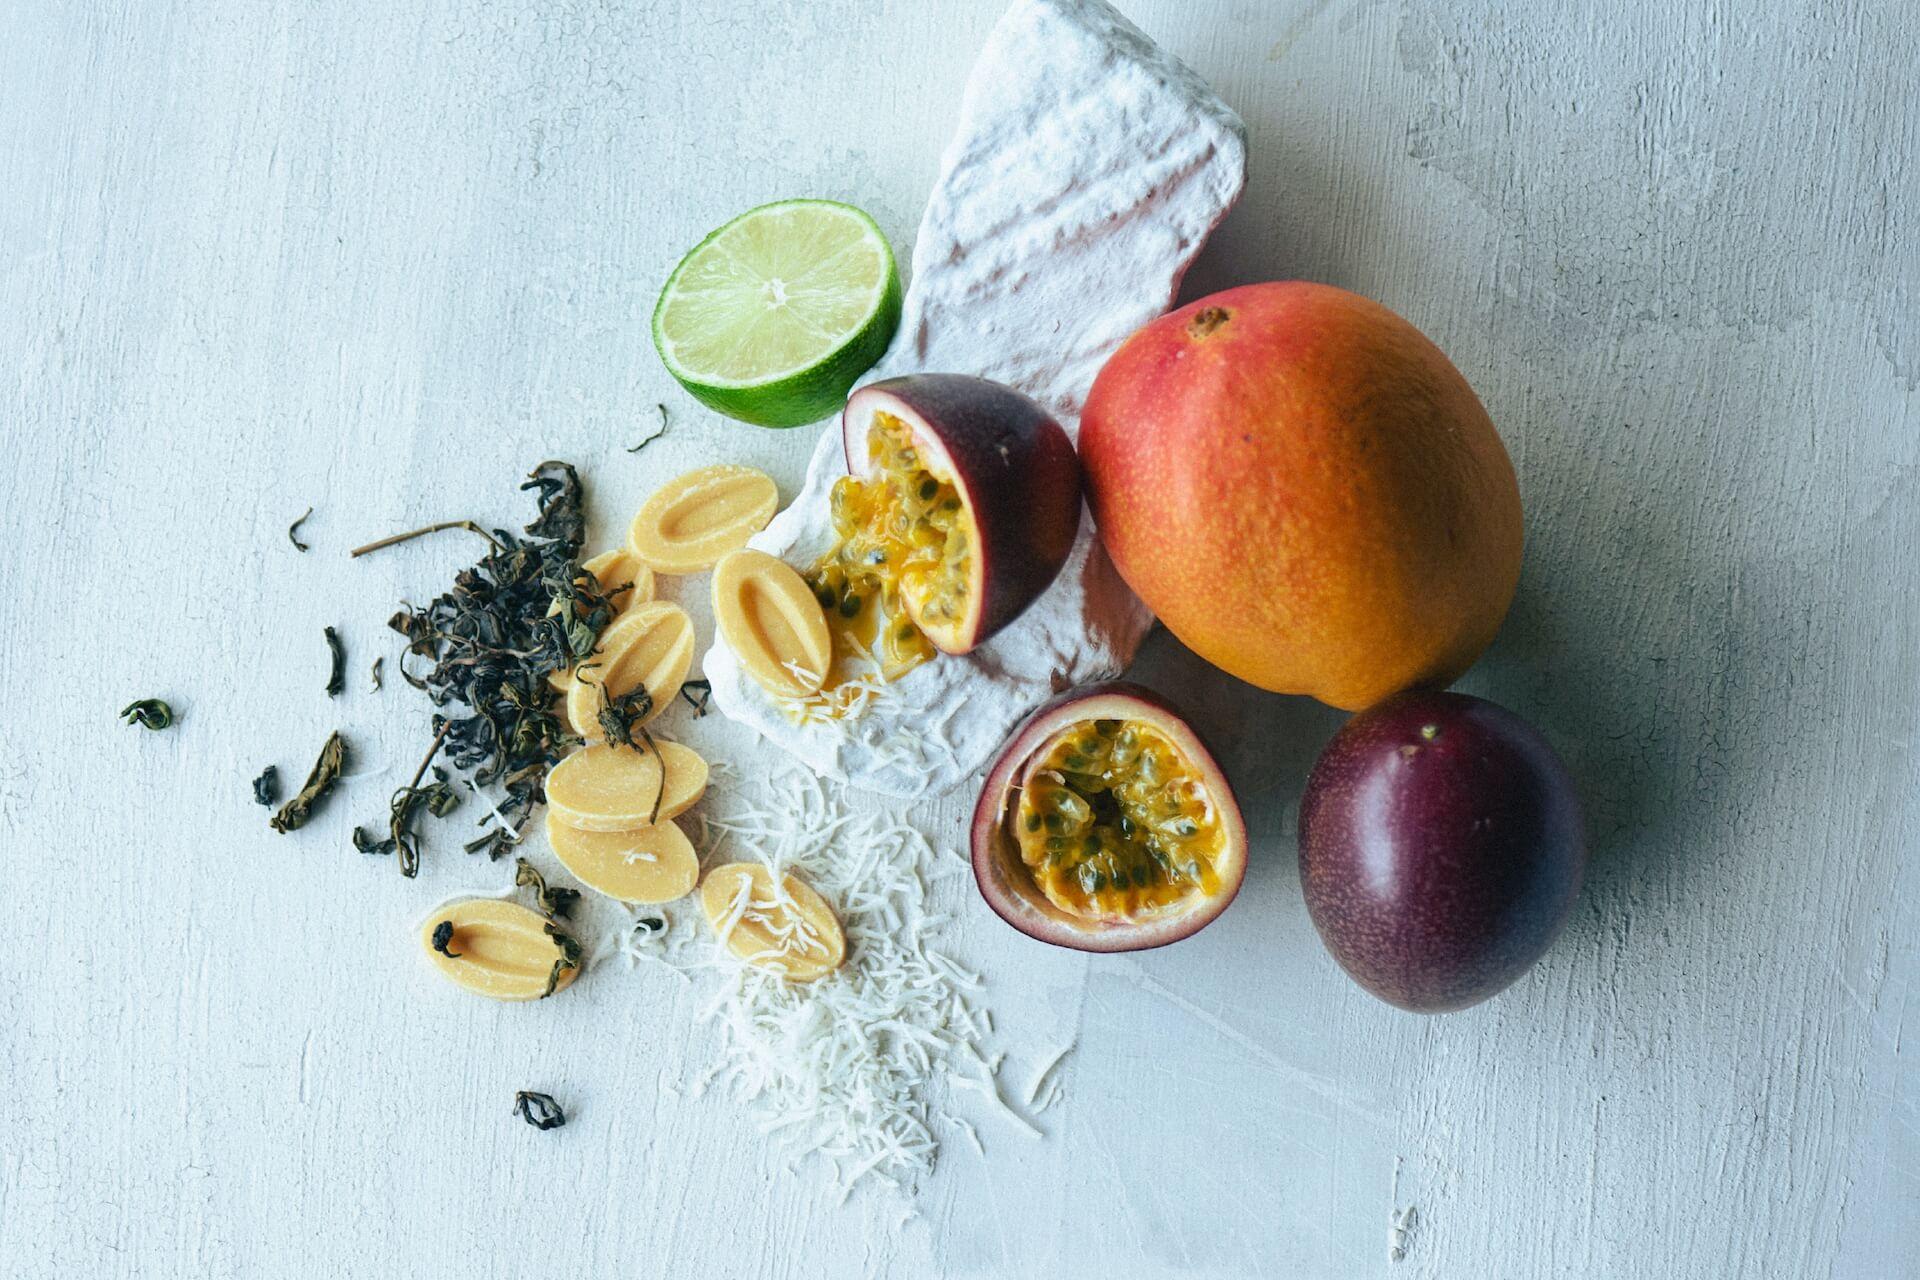 Mr. CHEESECAKEが、真夏の限定フレーバー「Mr. CHEESECAKE UN ETE mango passion」を4日間のみ発売! gourmet_210721_cheesecake1